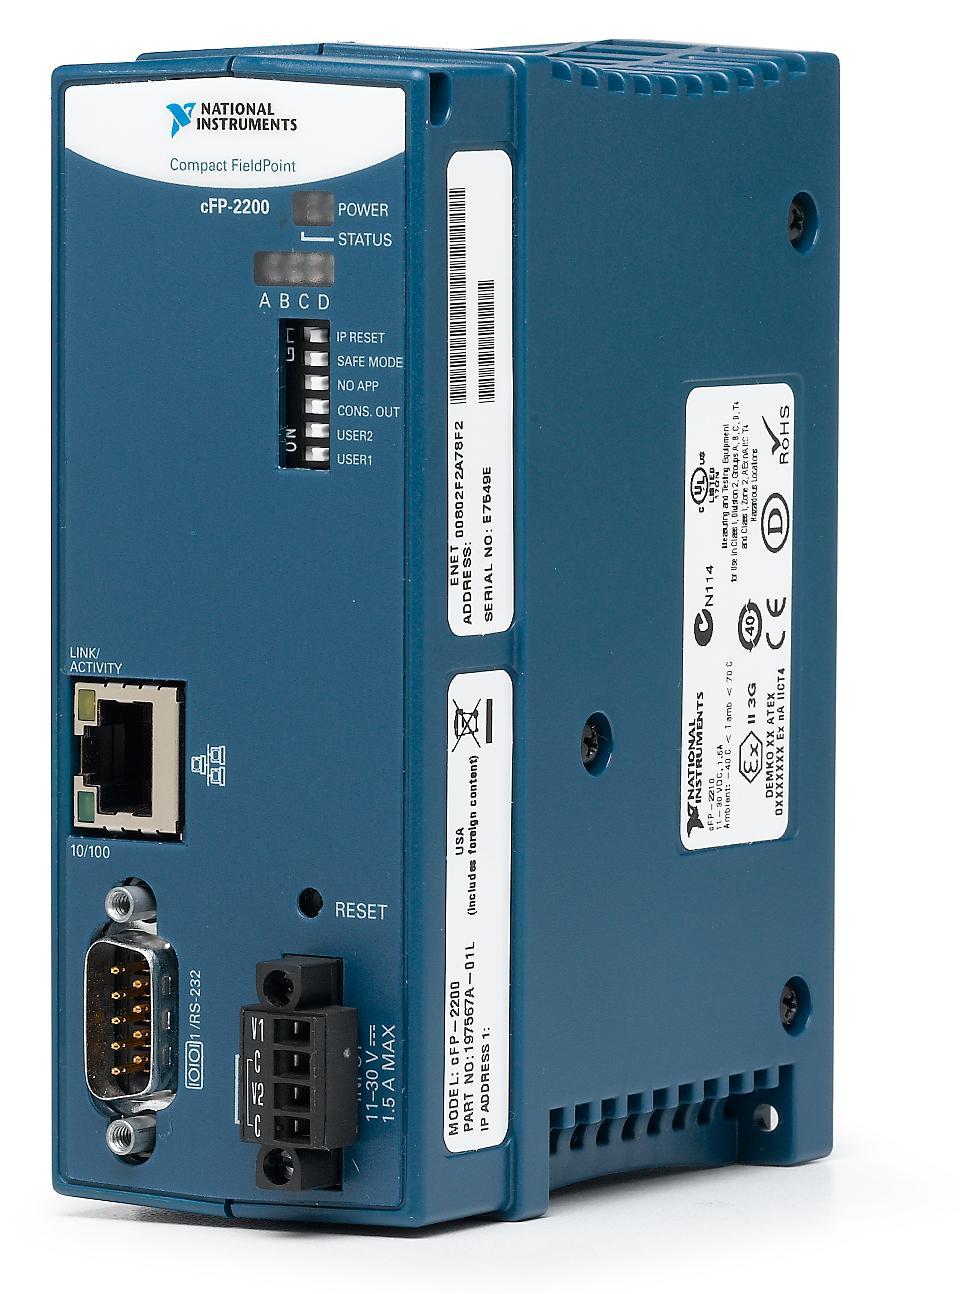 cFP-2200